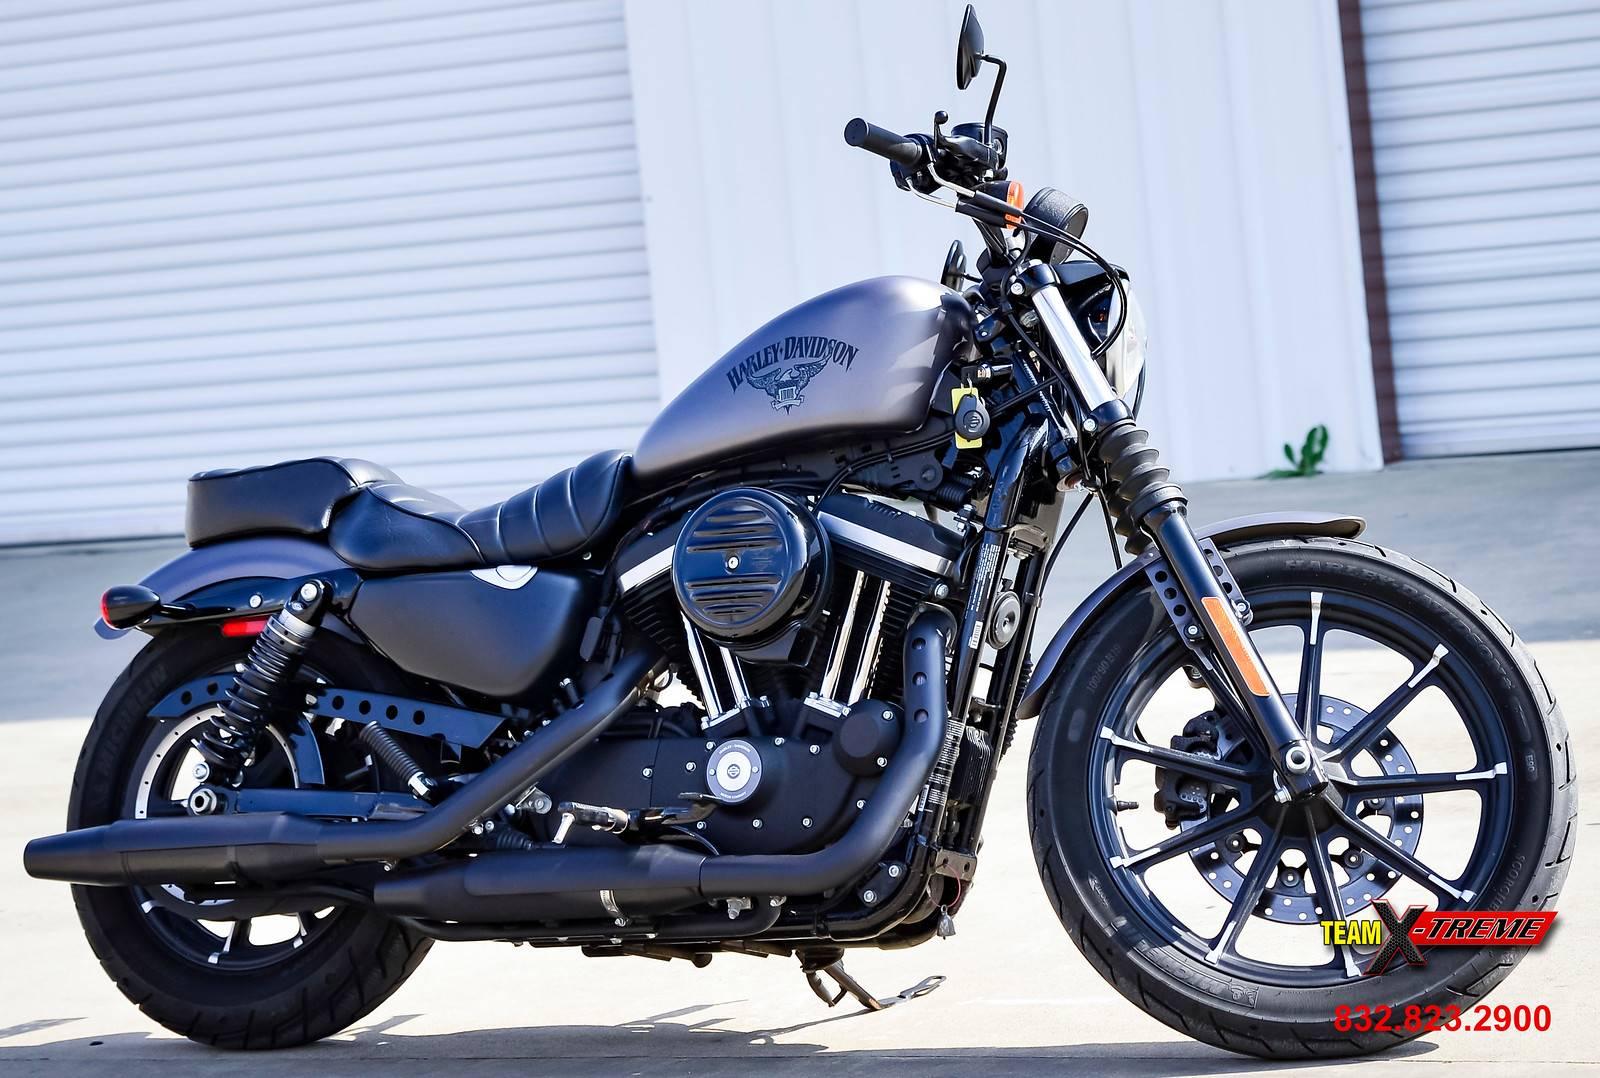 Used 2017 Harley Davidson Iron 883 Motorcycles In Houston Tx